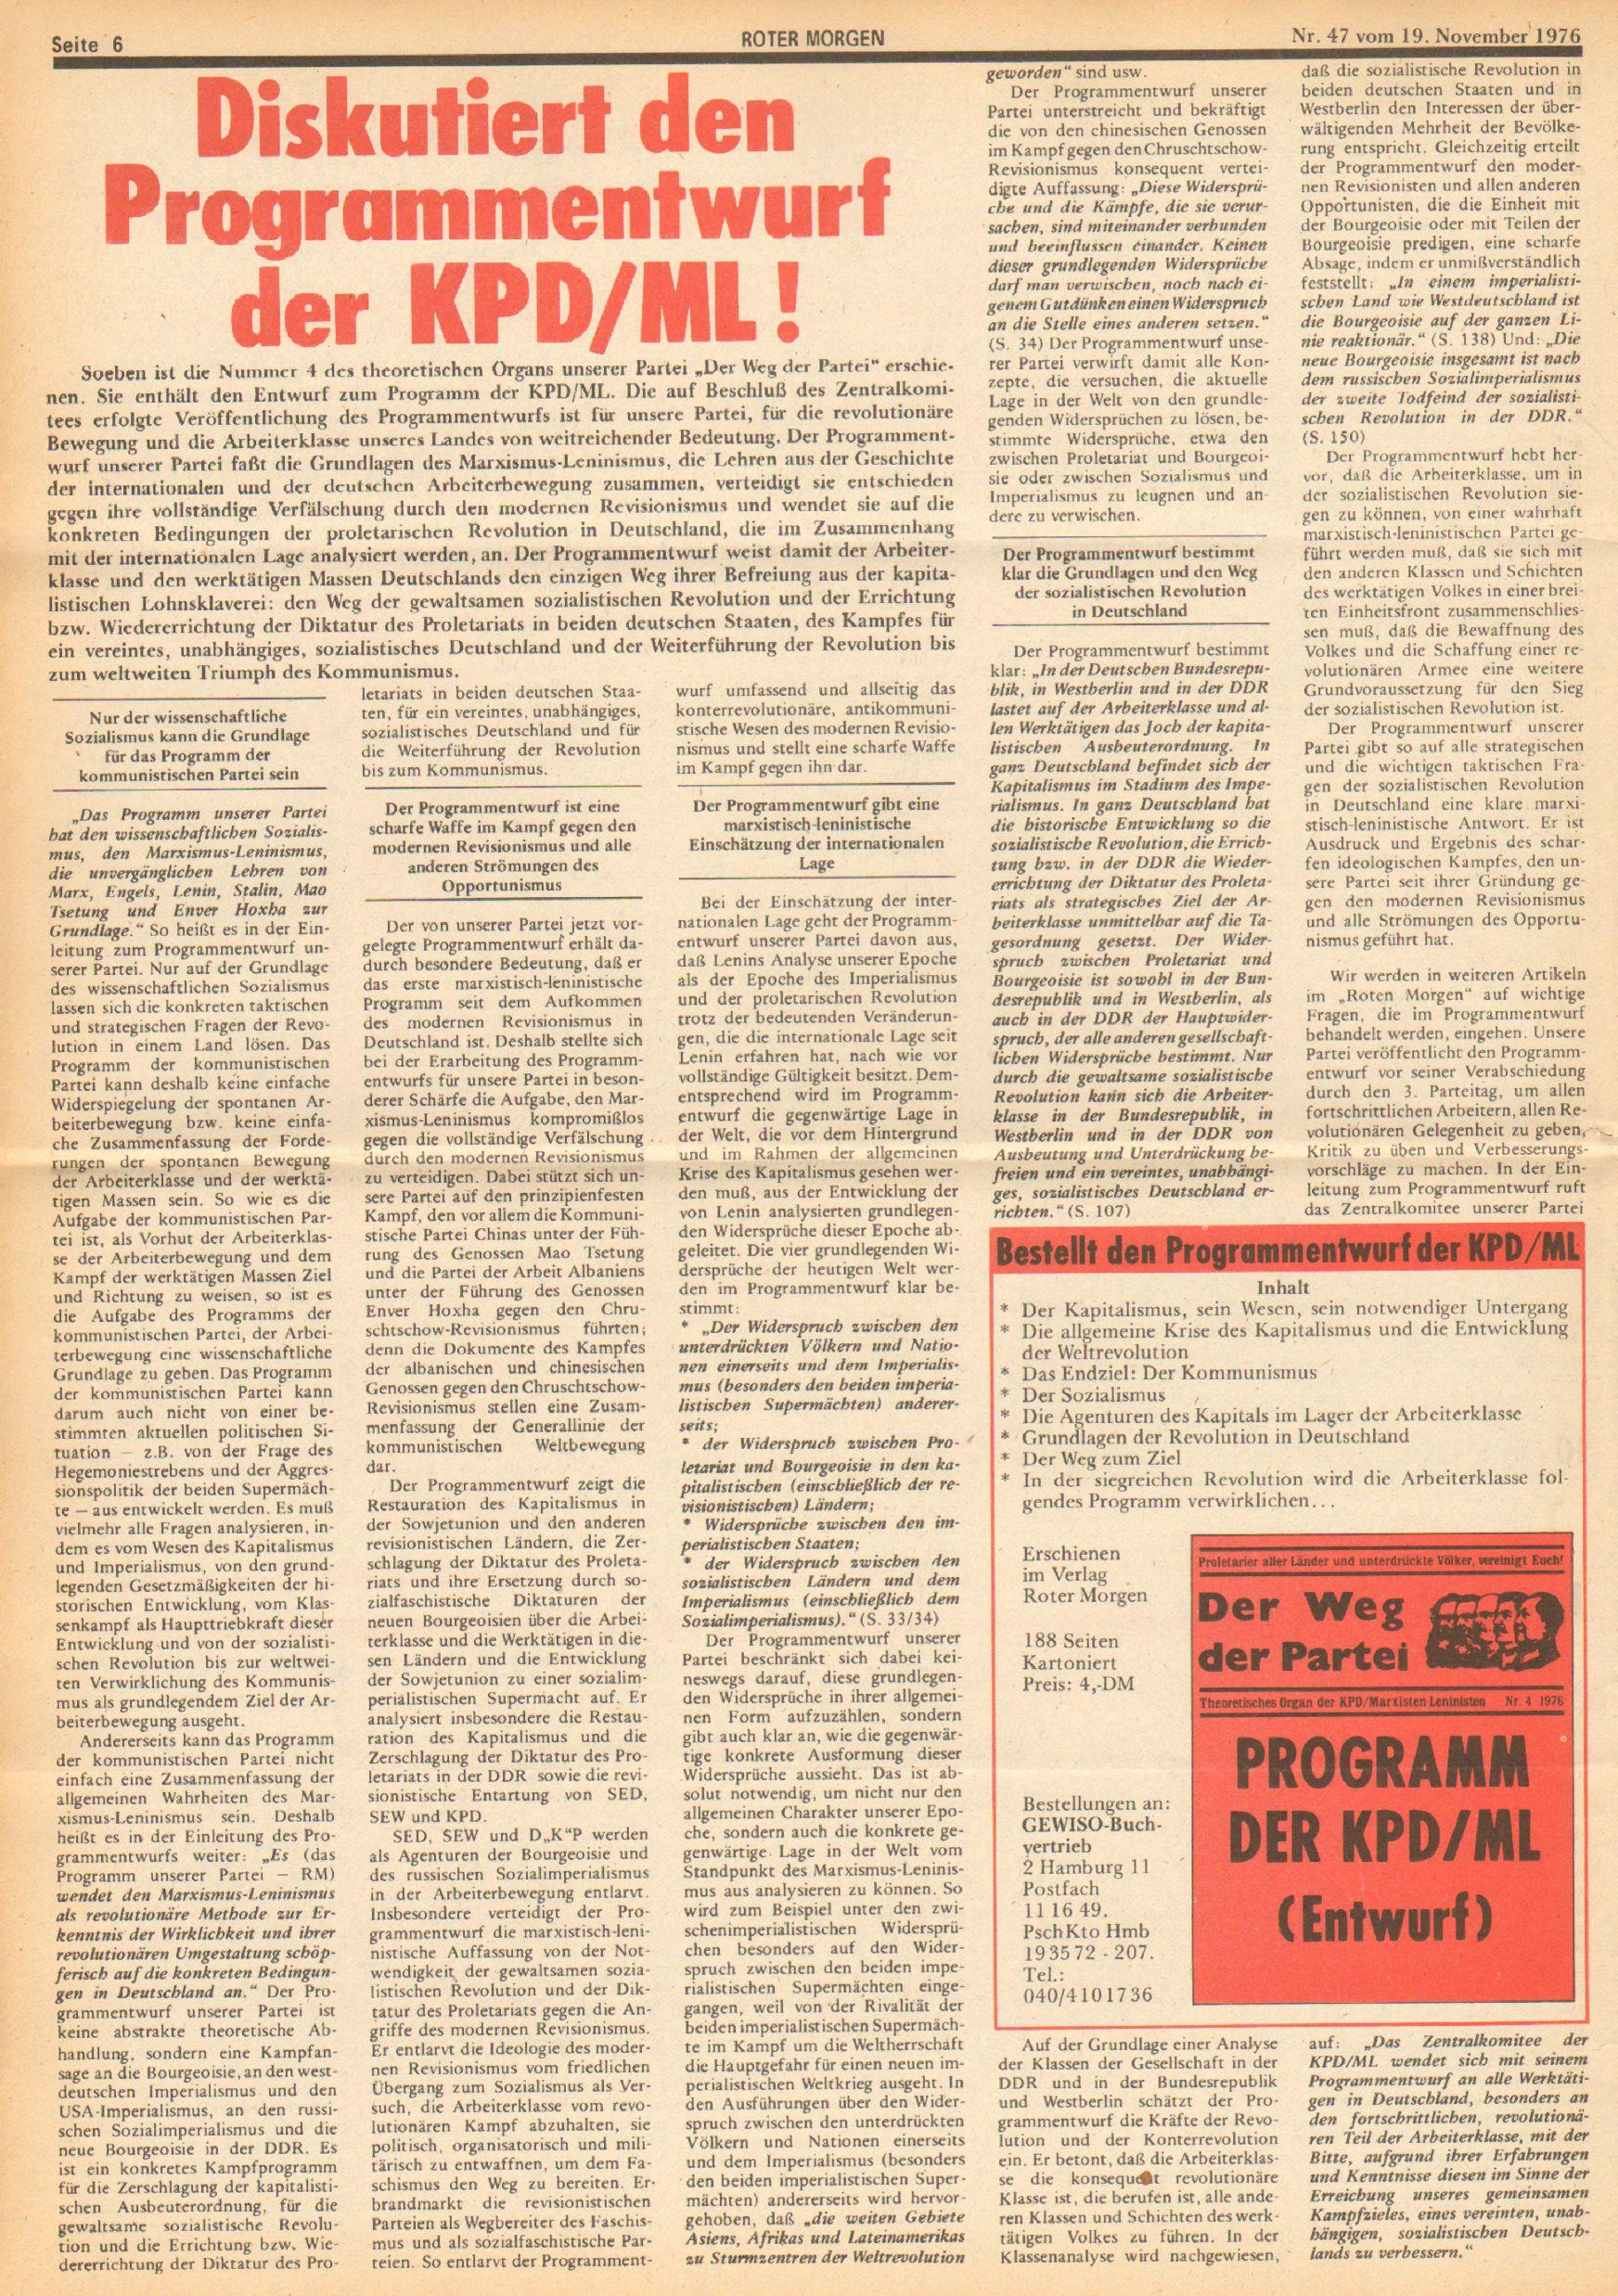 Roter Morgen, 10. Jg., 19. November 1976, Nr. 47, Seite 6